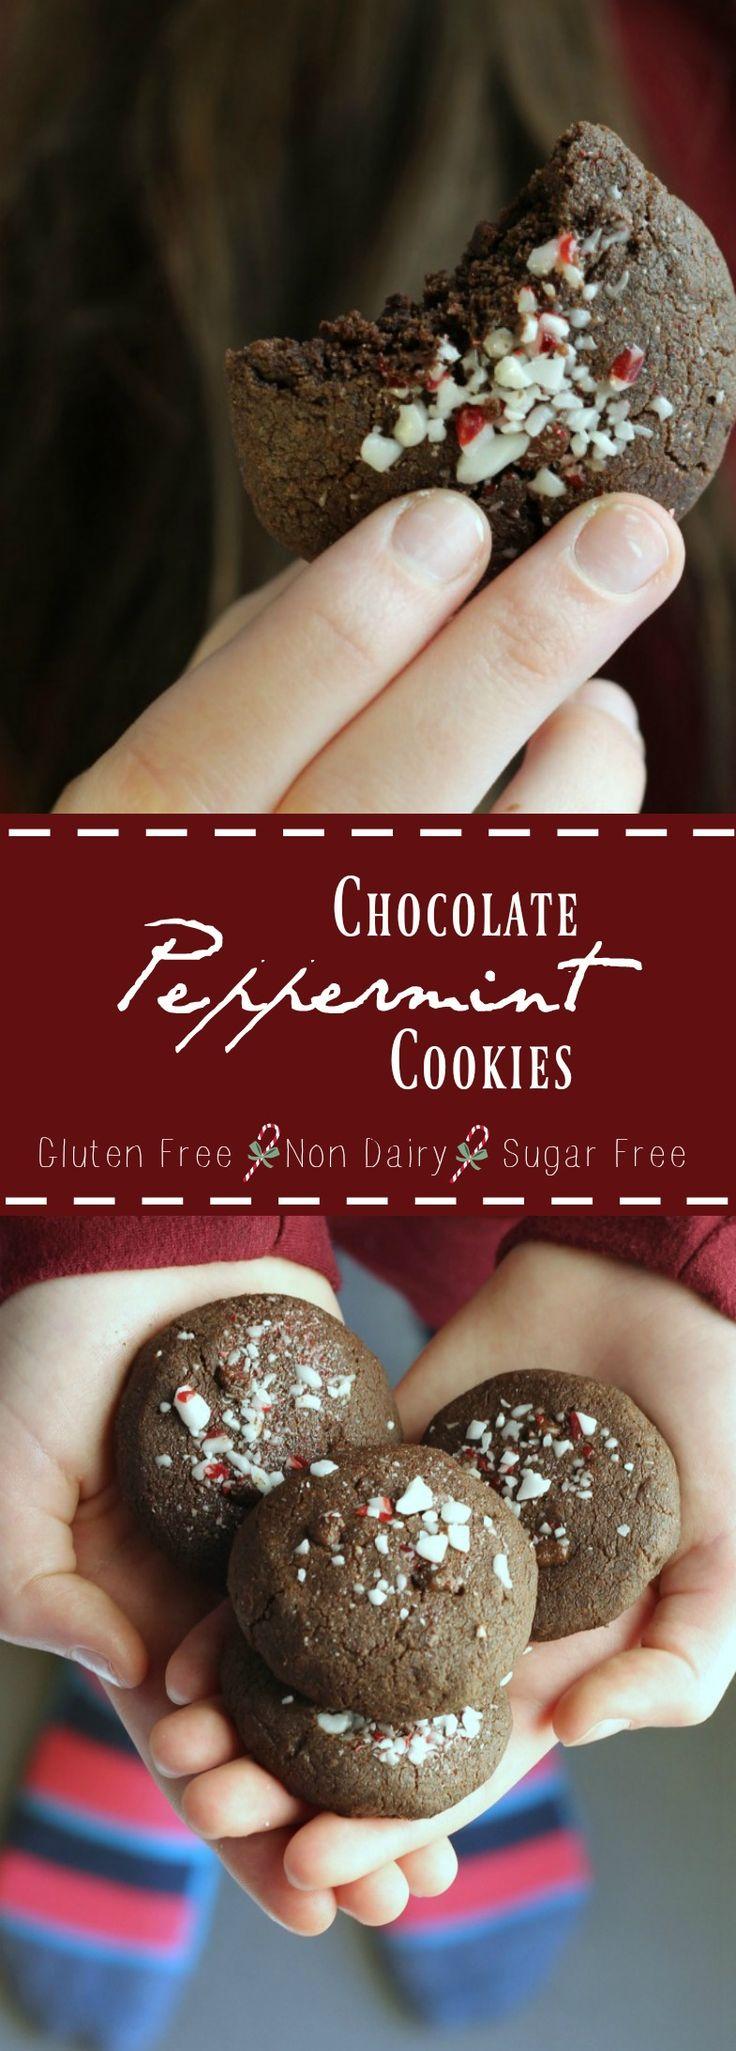 Double Chocolate Peppermint Cookies (Vegan + Gluten Free) | gardeninthekitchen.com